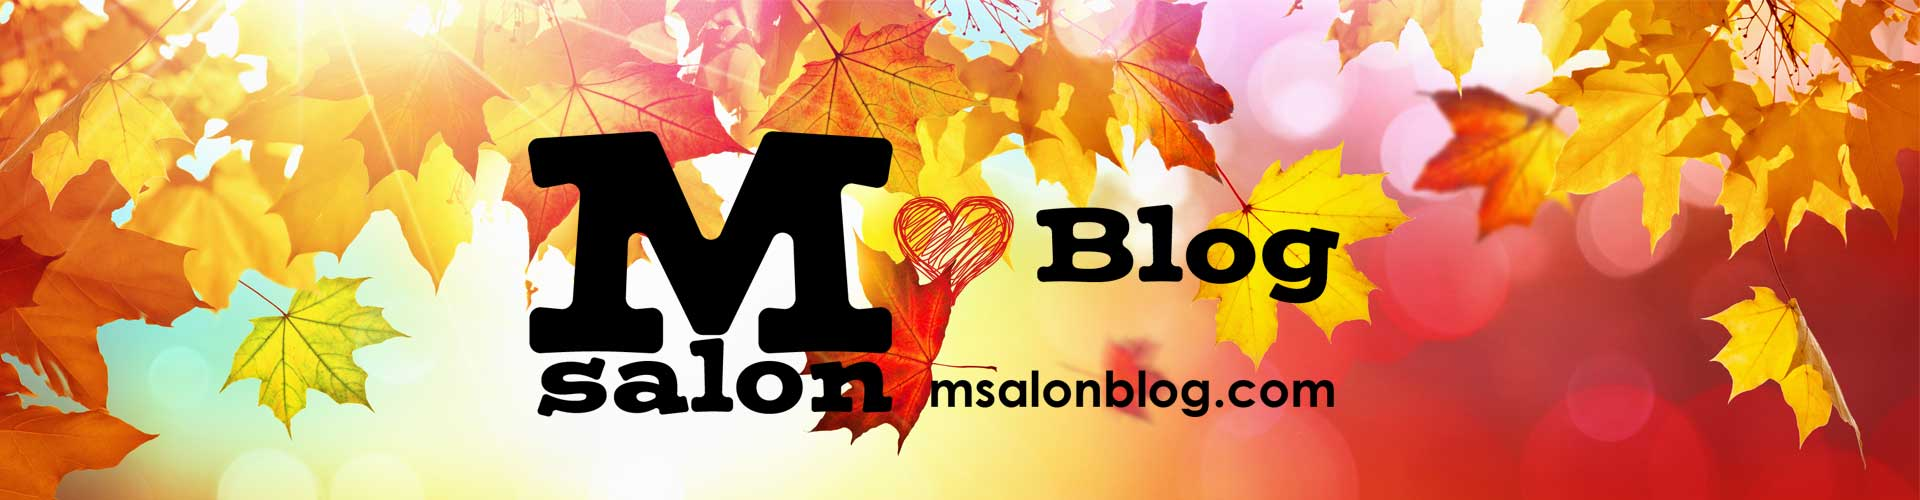 Msalonblog